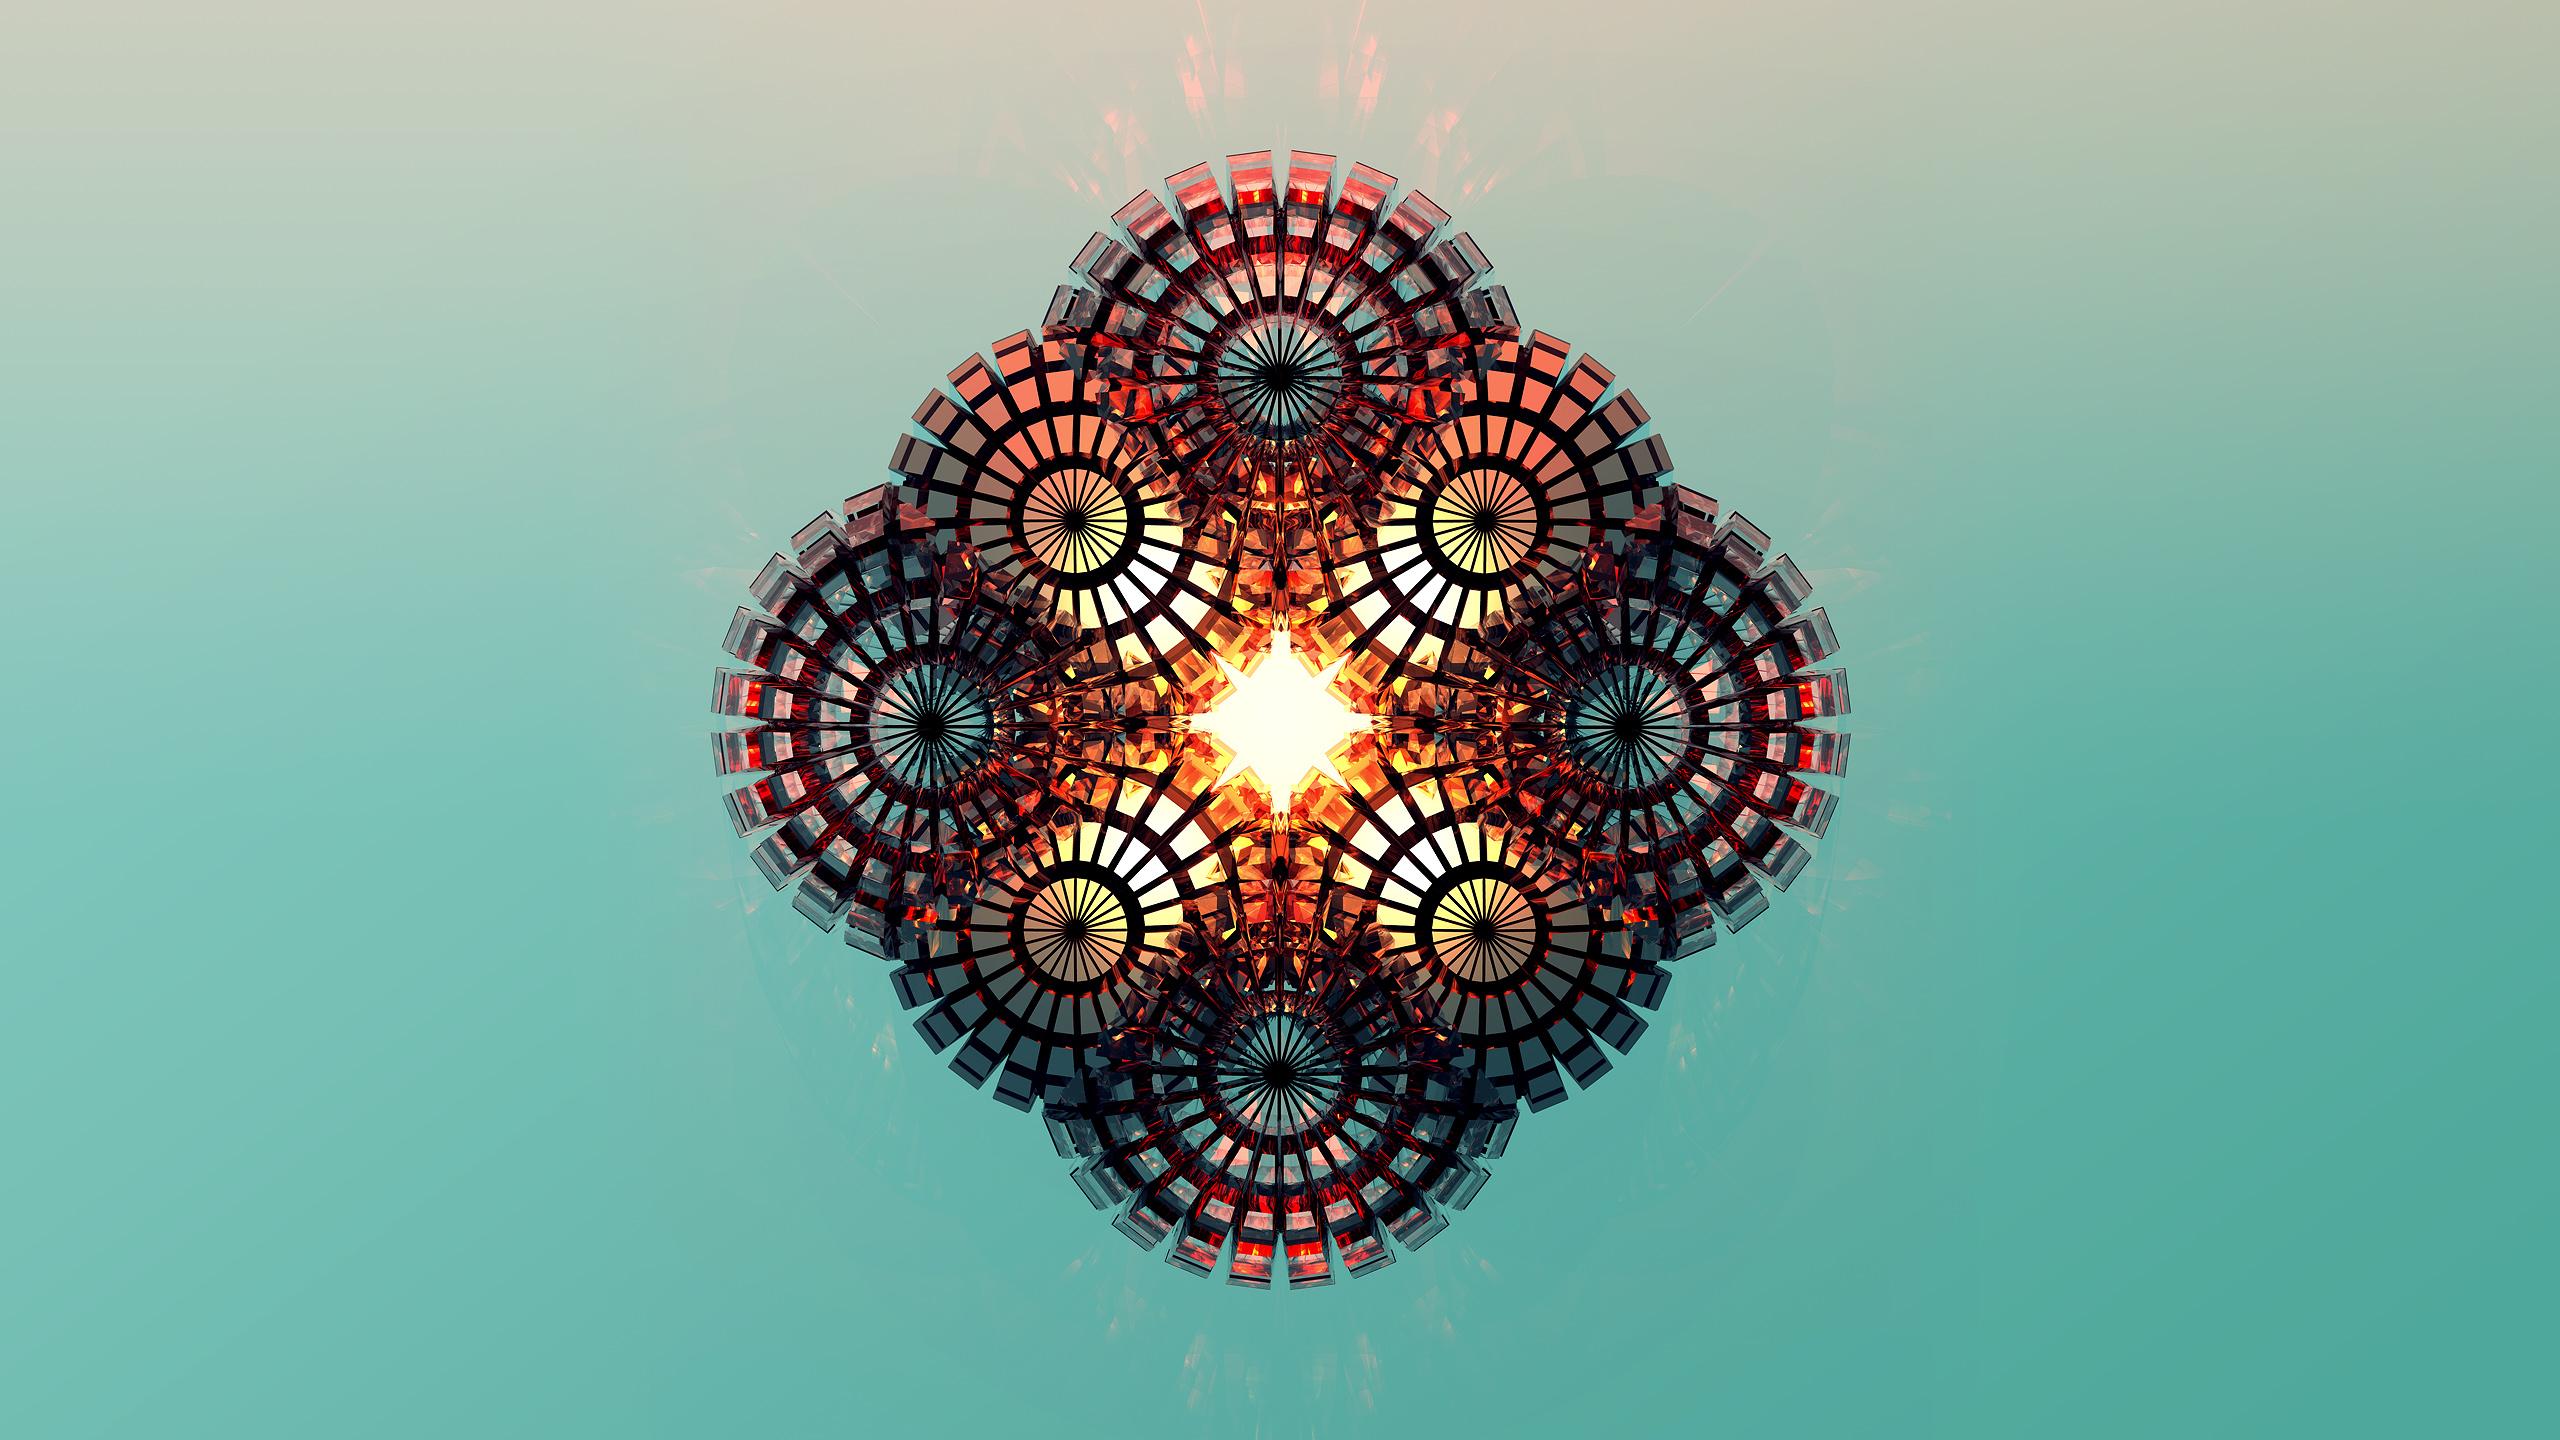 FACETS Mandala III 335365 2014 2560x1440